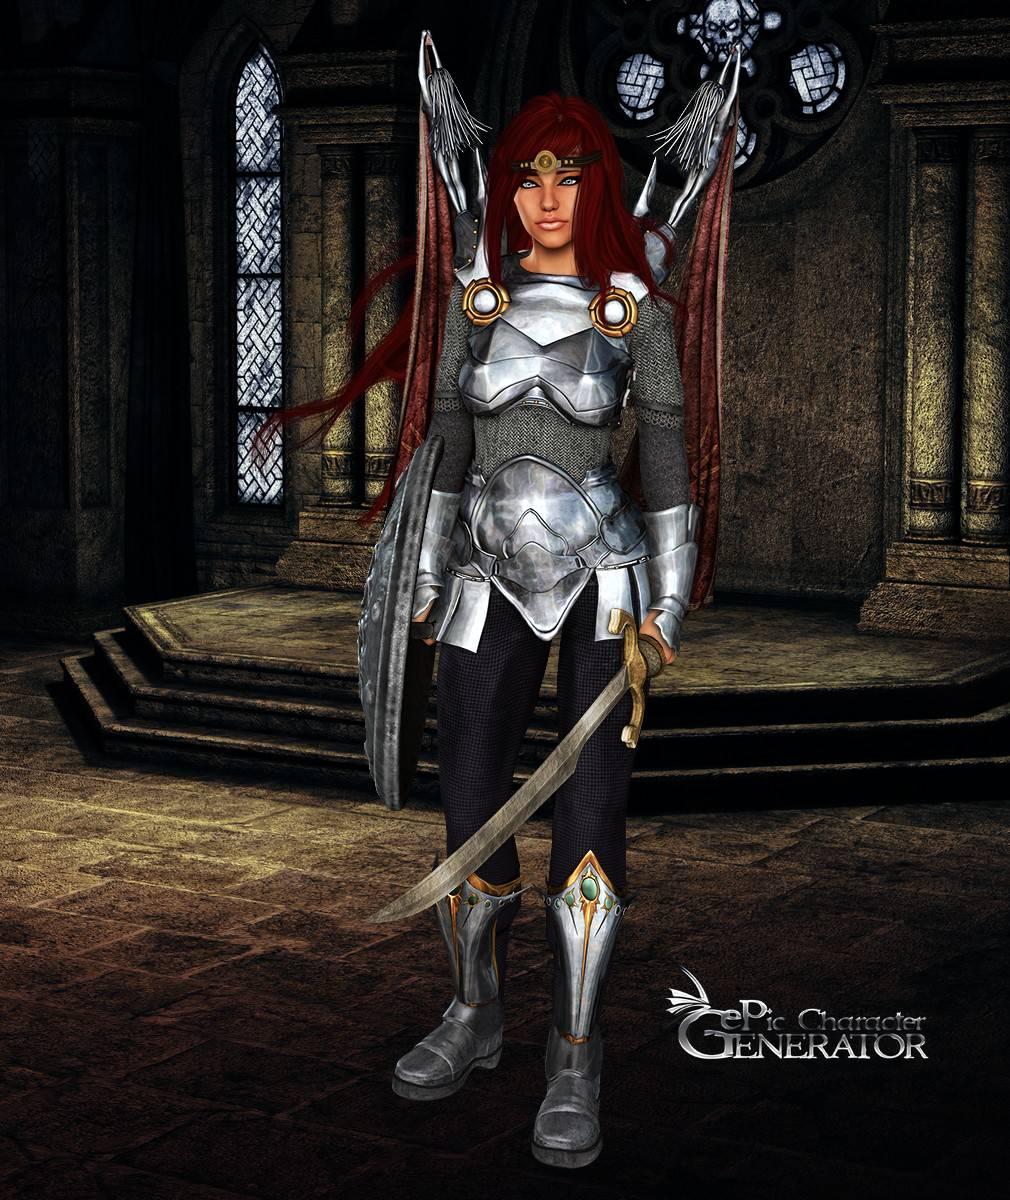 ePic Character Generator Season 2 Female Warrior Screenshot 15